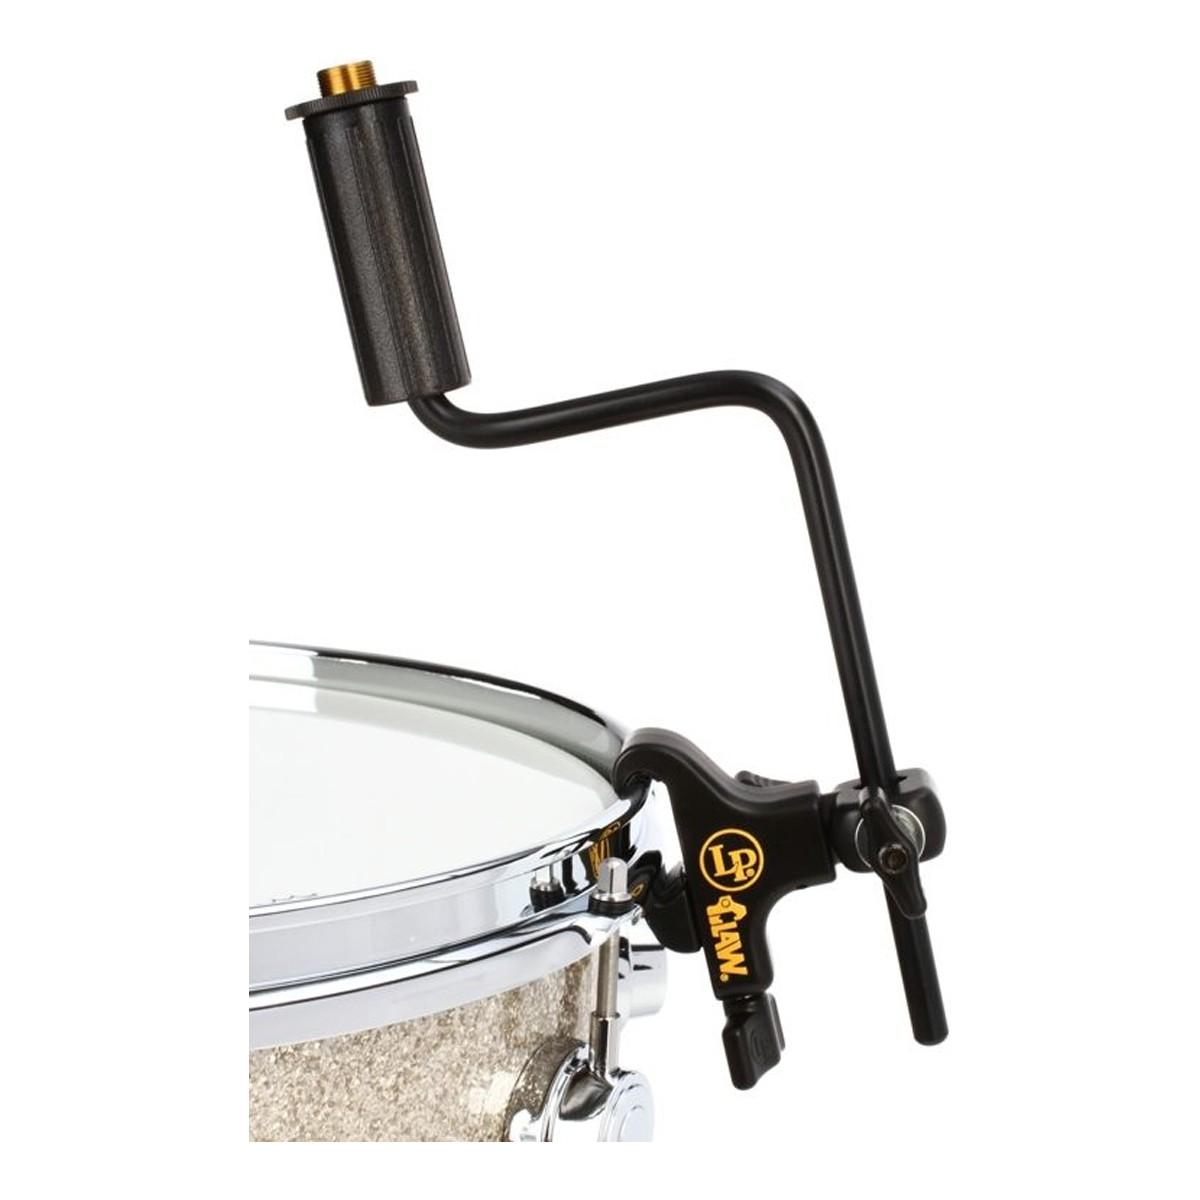 Kit com 6 clamps para microfone LP Z-rod LP592AX